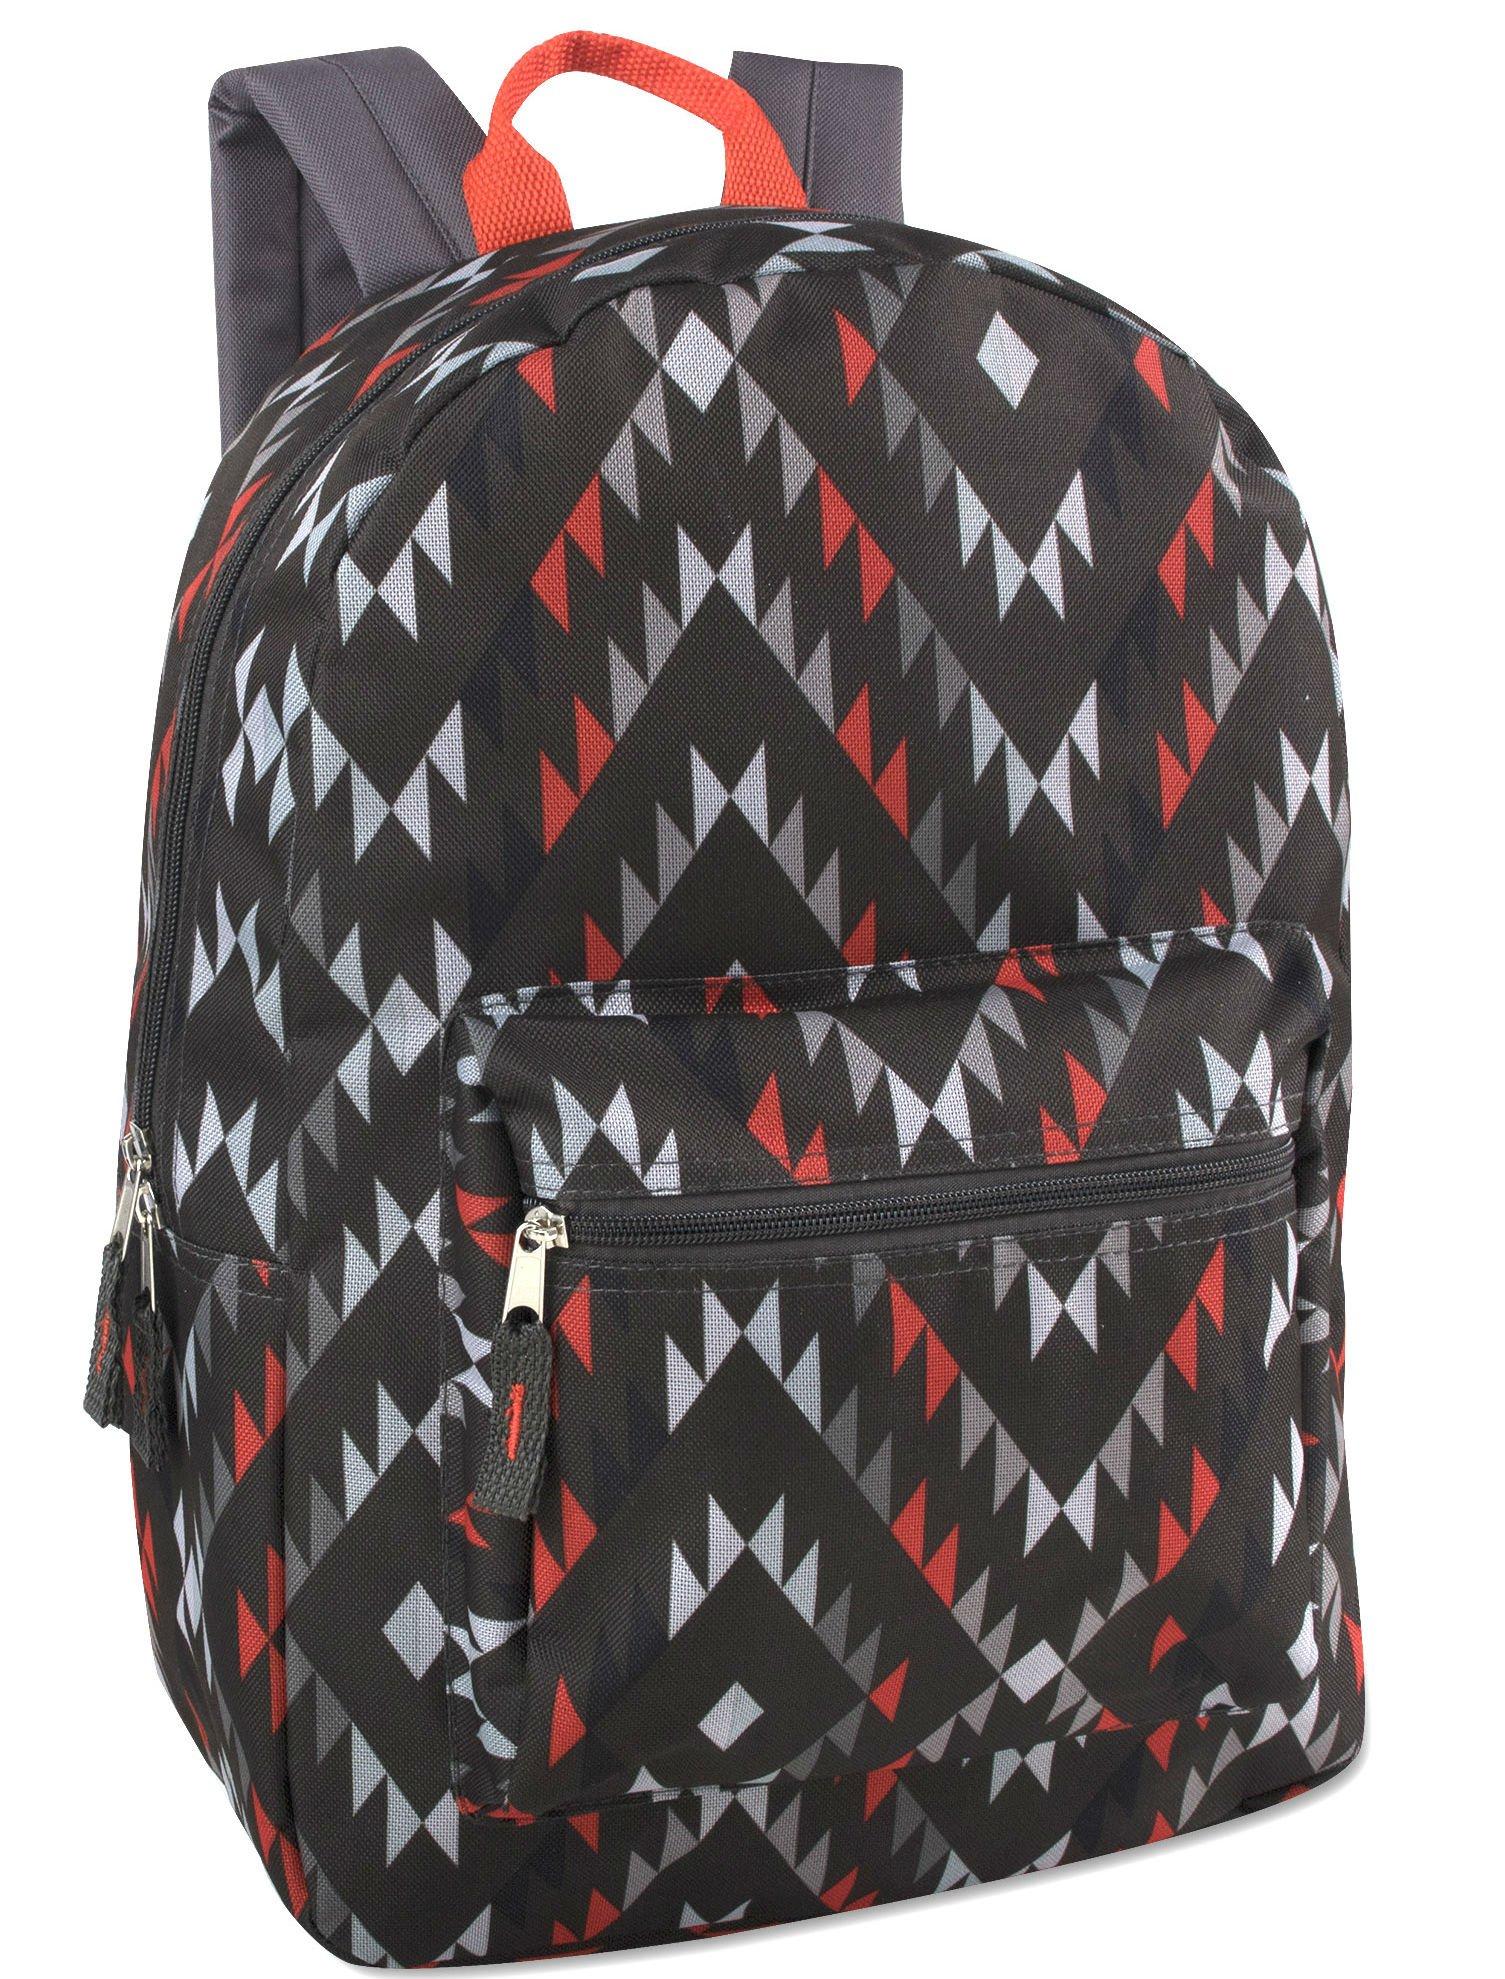 17'' Trailmaker Backpack Bookbag -Aztec 4614 by Trail maker (Image #1)